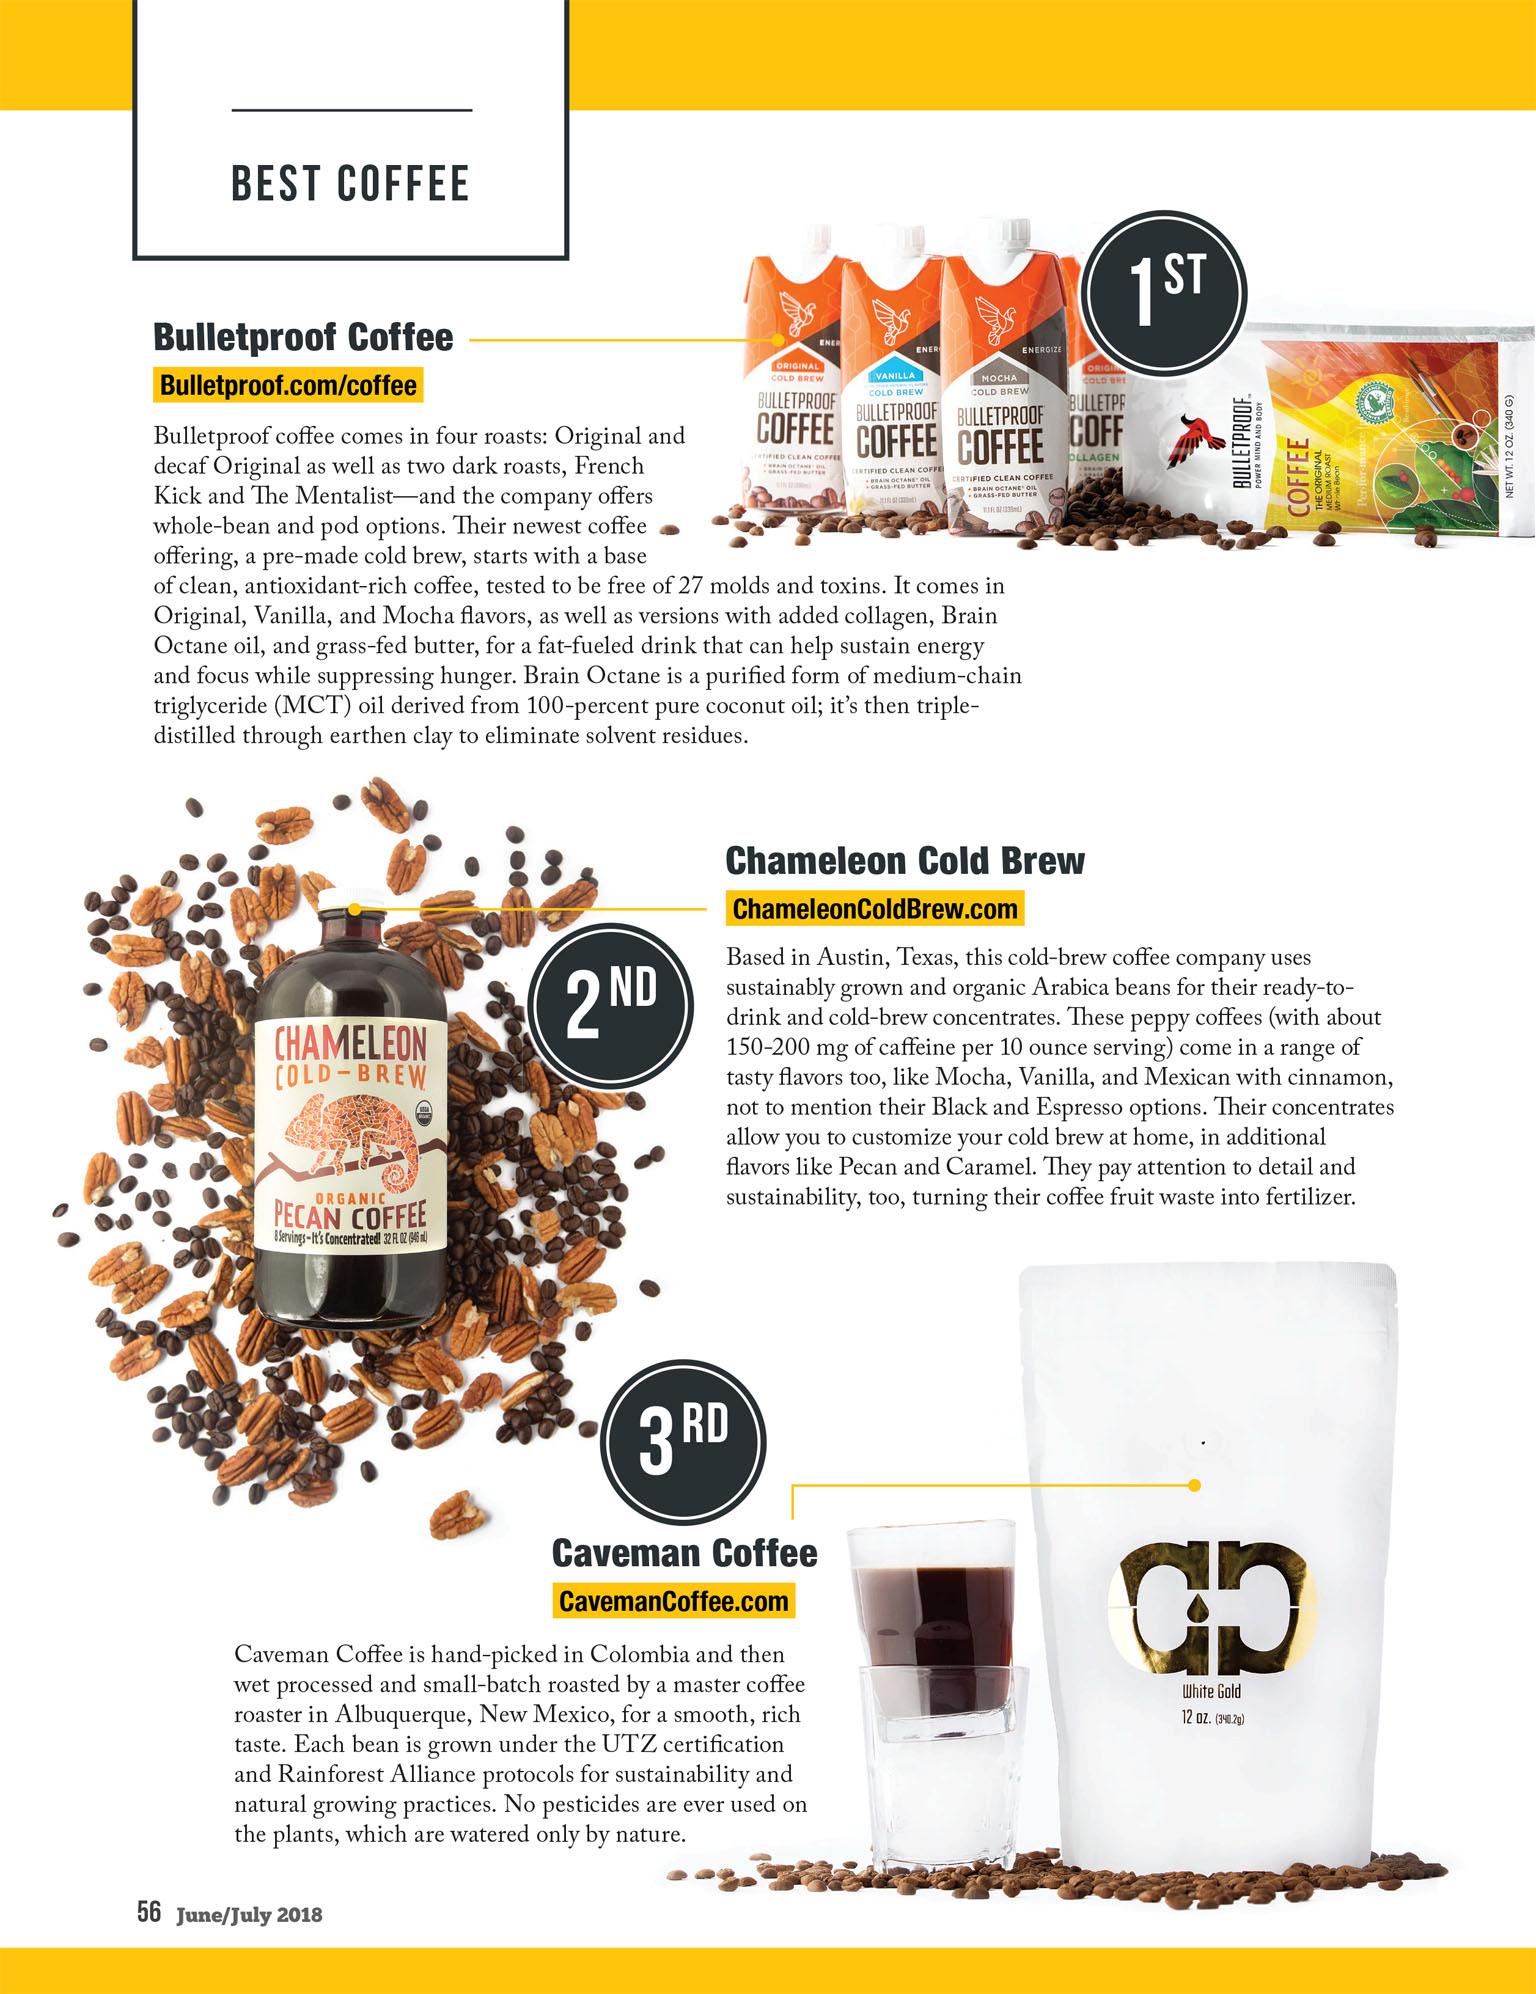 Best Paleo Coffee | Bulletproof, Chameleon Cold Brew, Caveman Coffee | Paleo Magazine